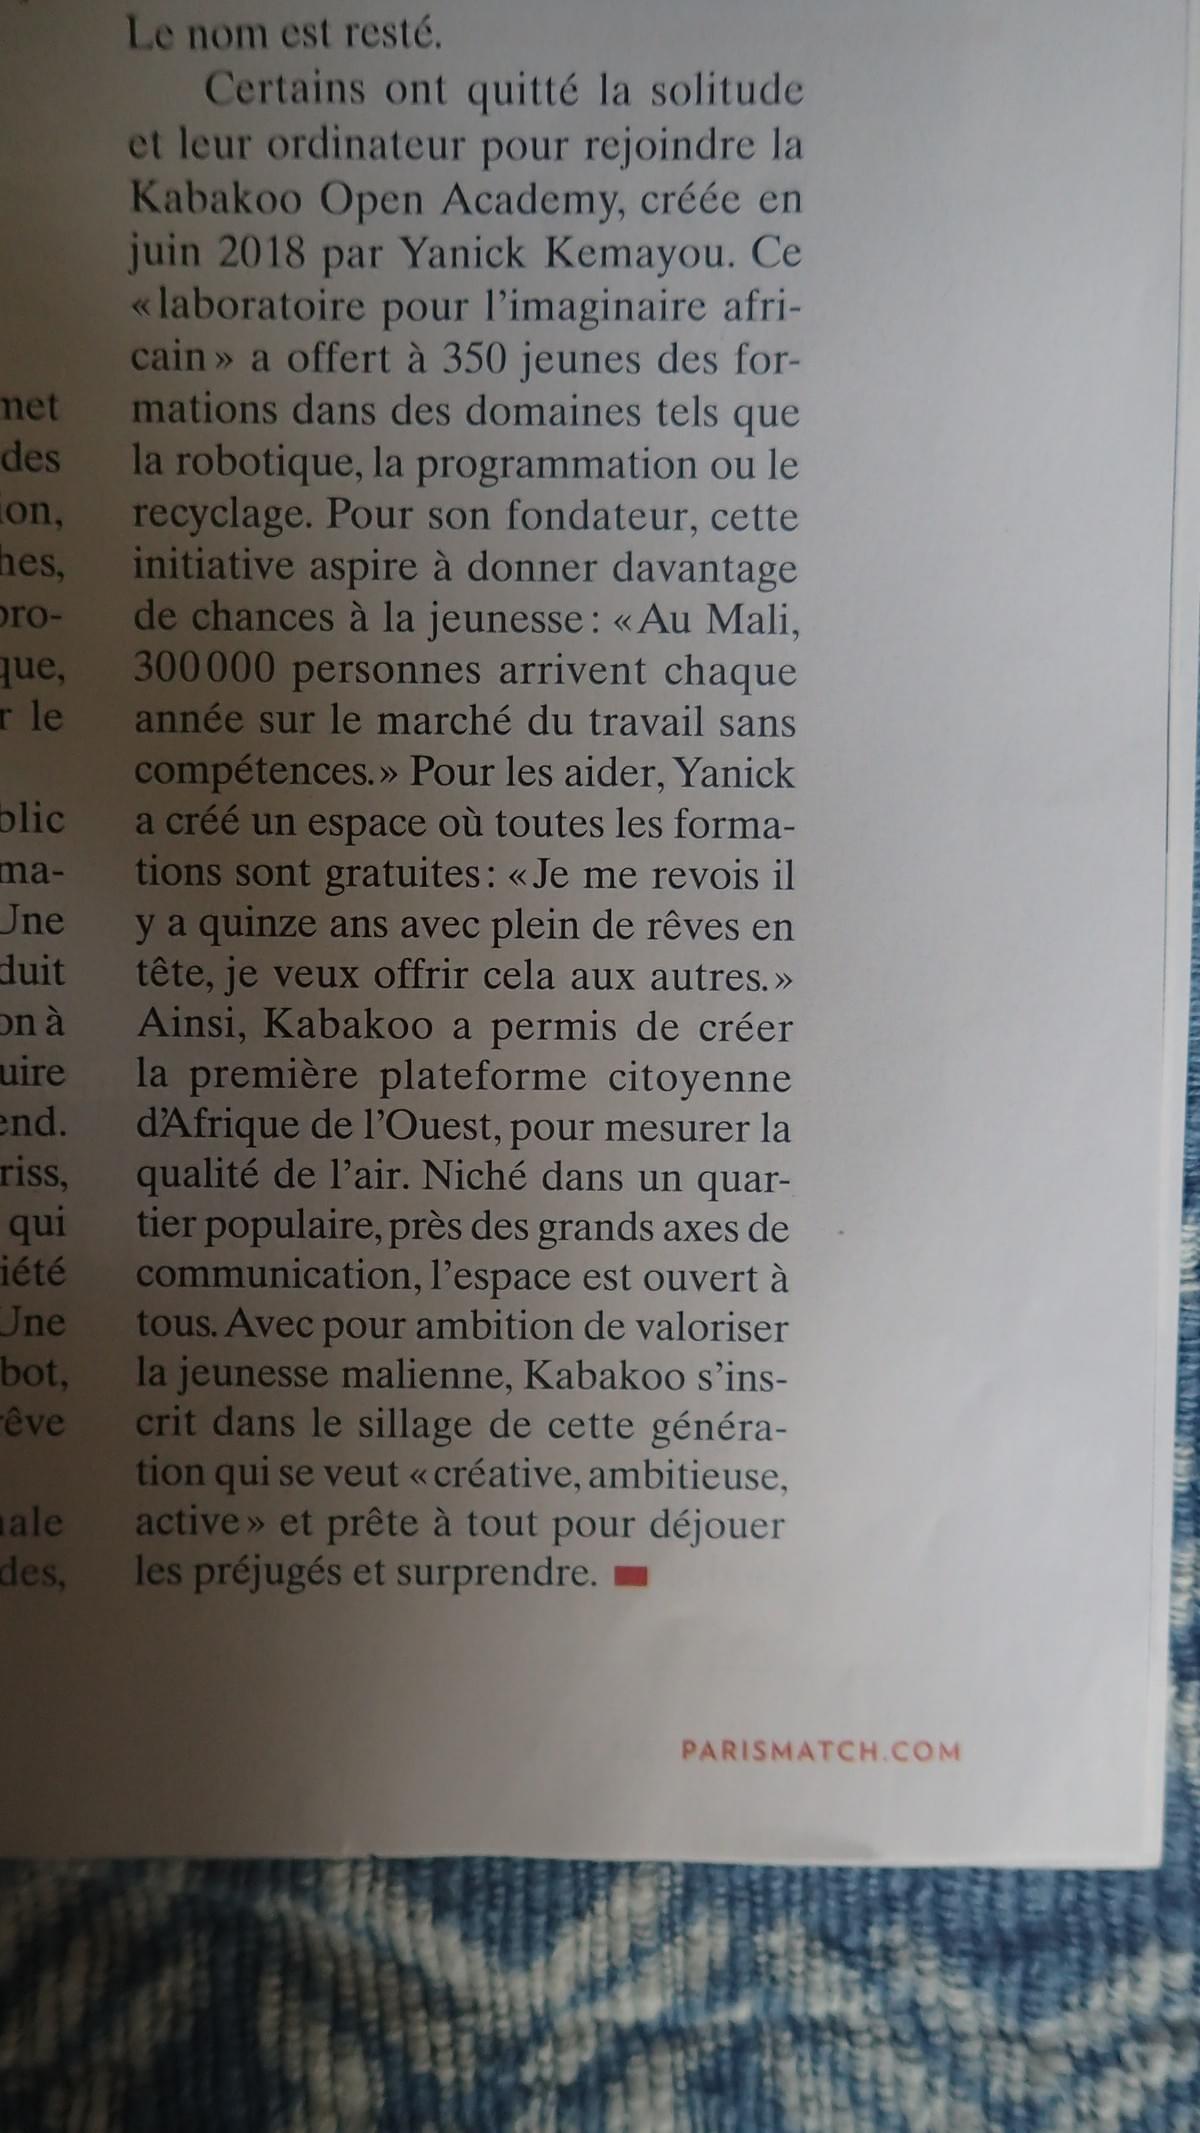 Kabakoo Bamako   Mali in Paris Match